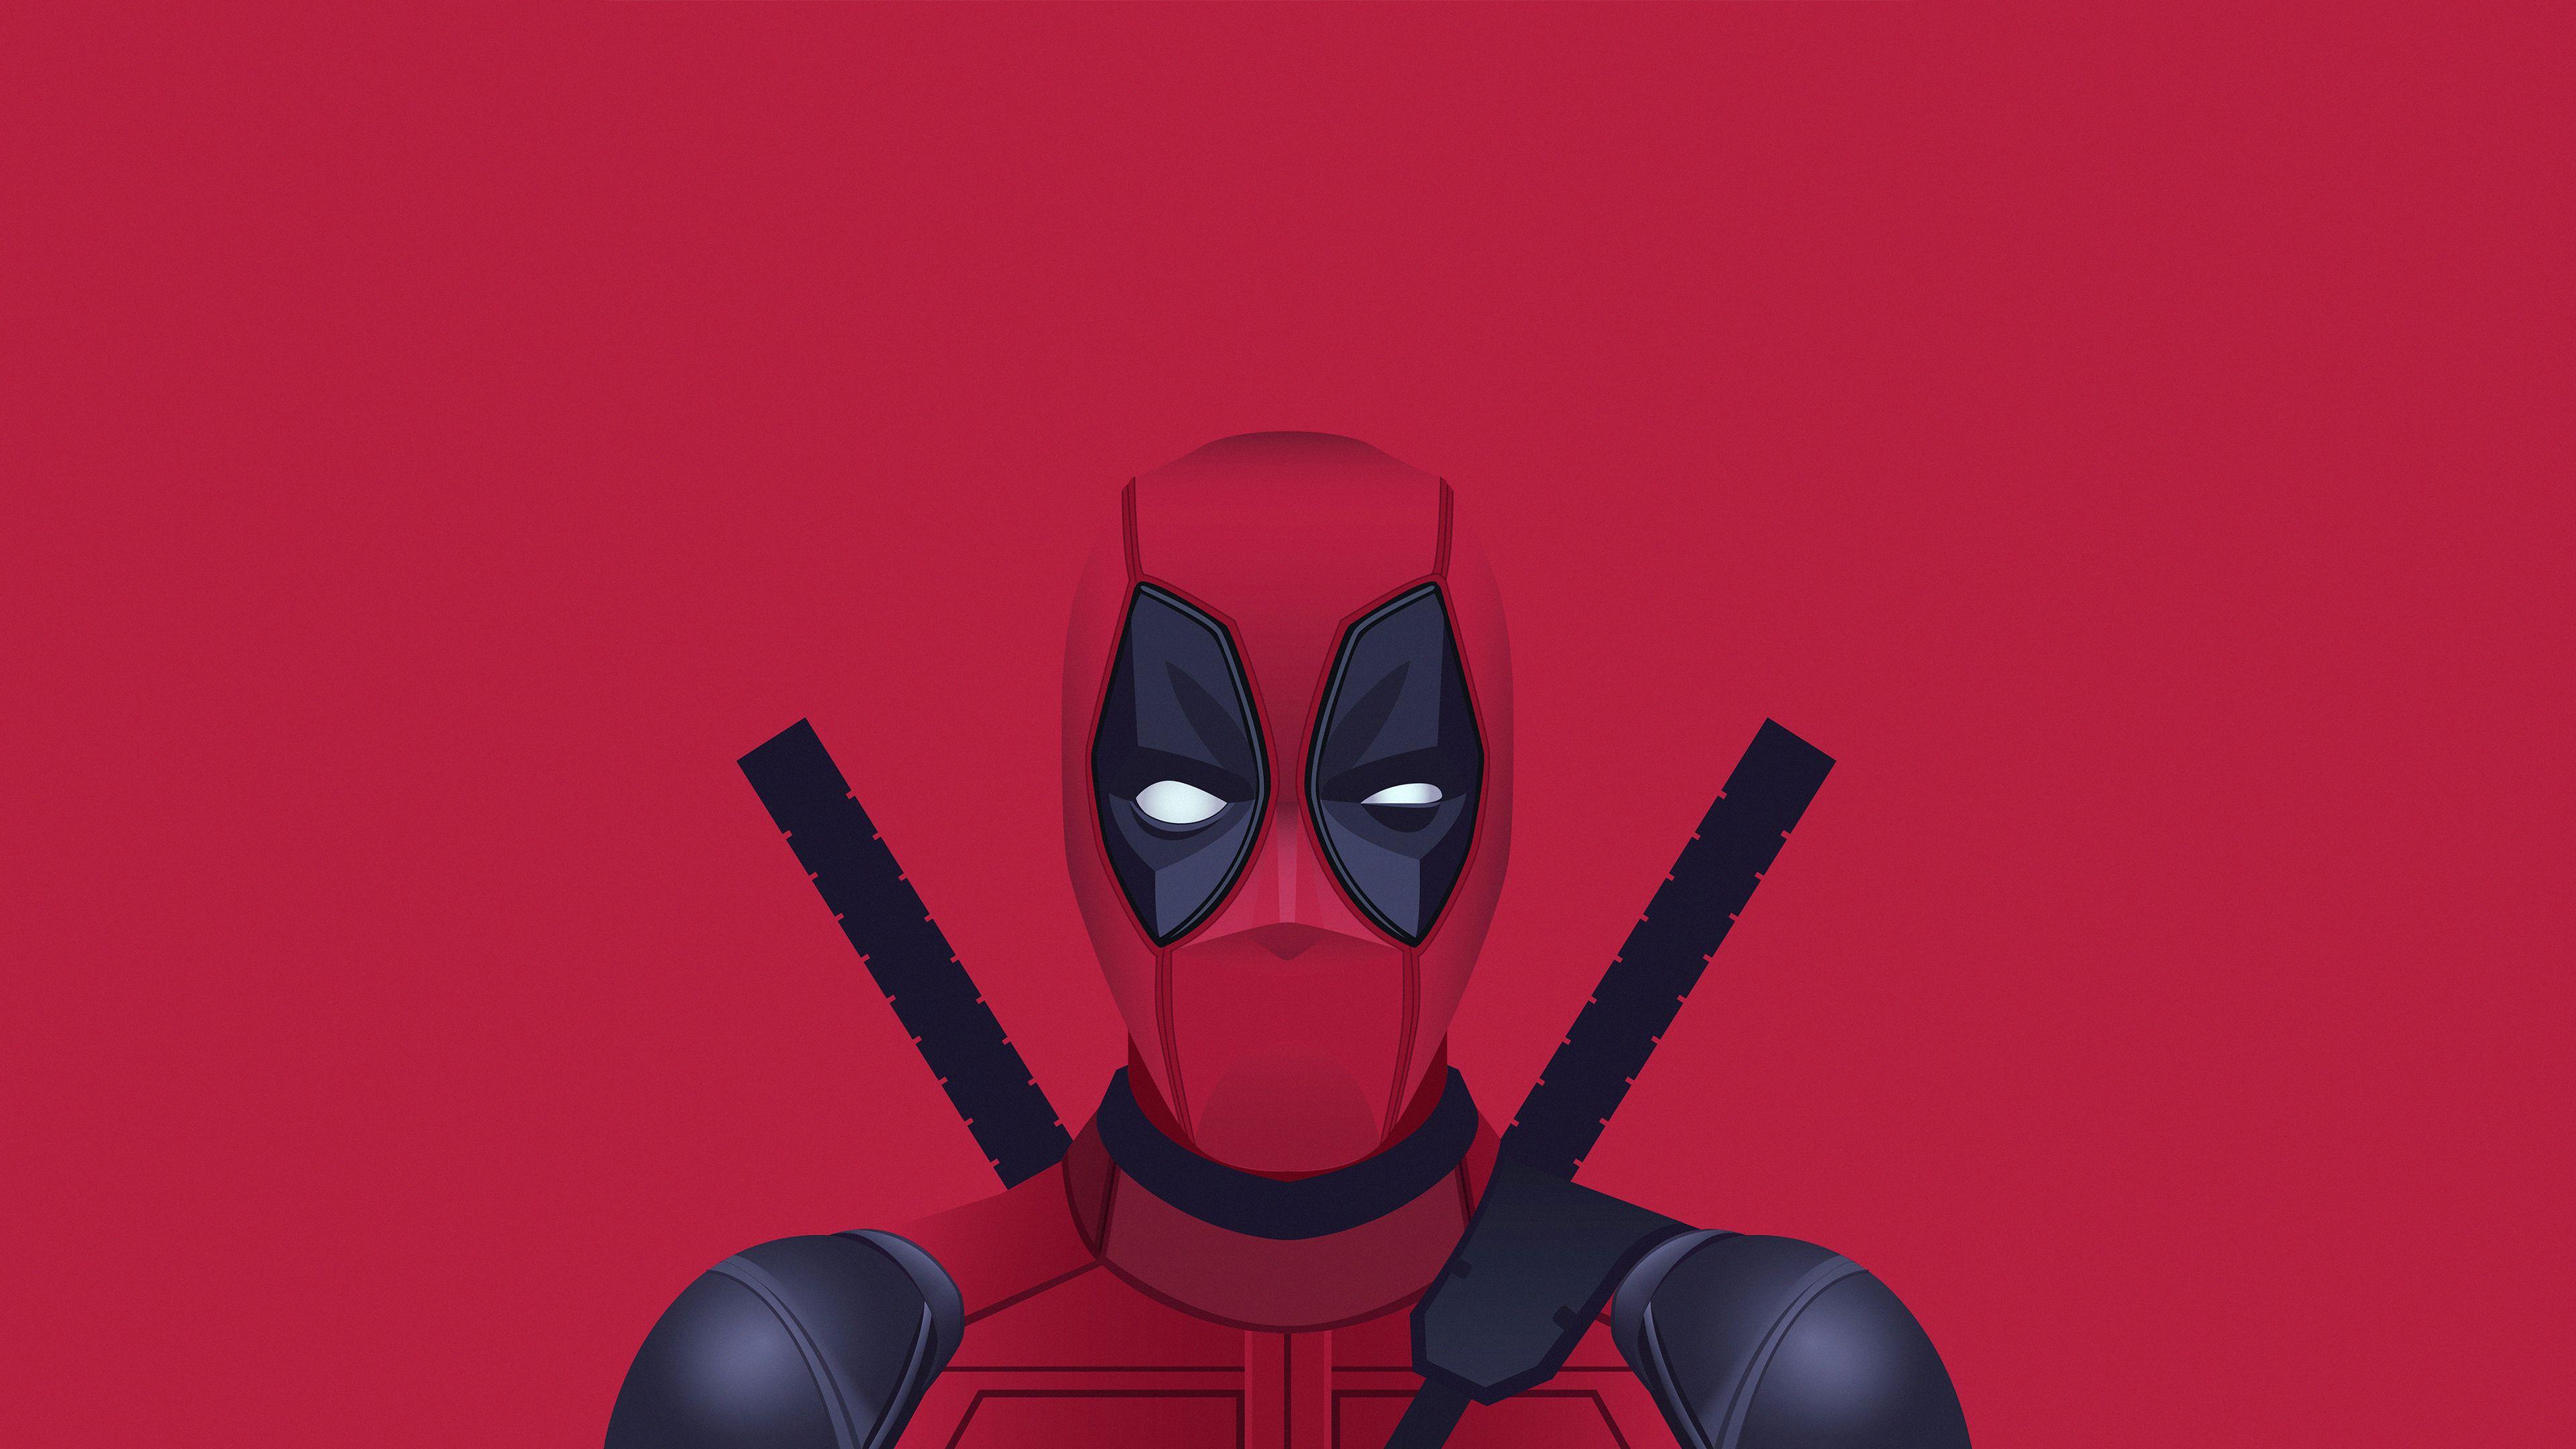 Deadpool Arts 4k Superheroes Wallpapers Hd Wallpapers Digital Art Wallpapers Deadpool Wallpapers Behance Wall Deadpool Art Deadpool Wallpaper Art Wallpaper